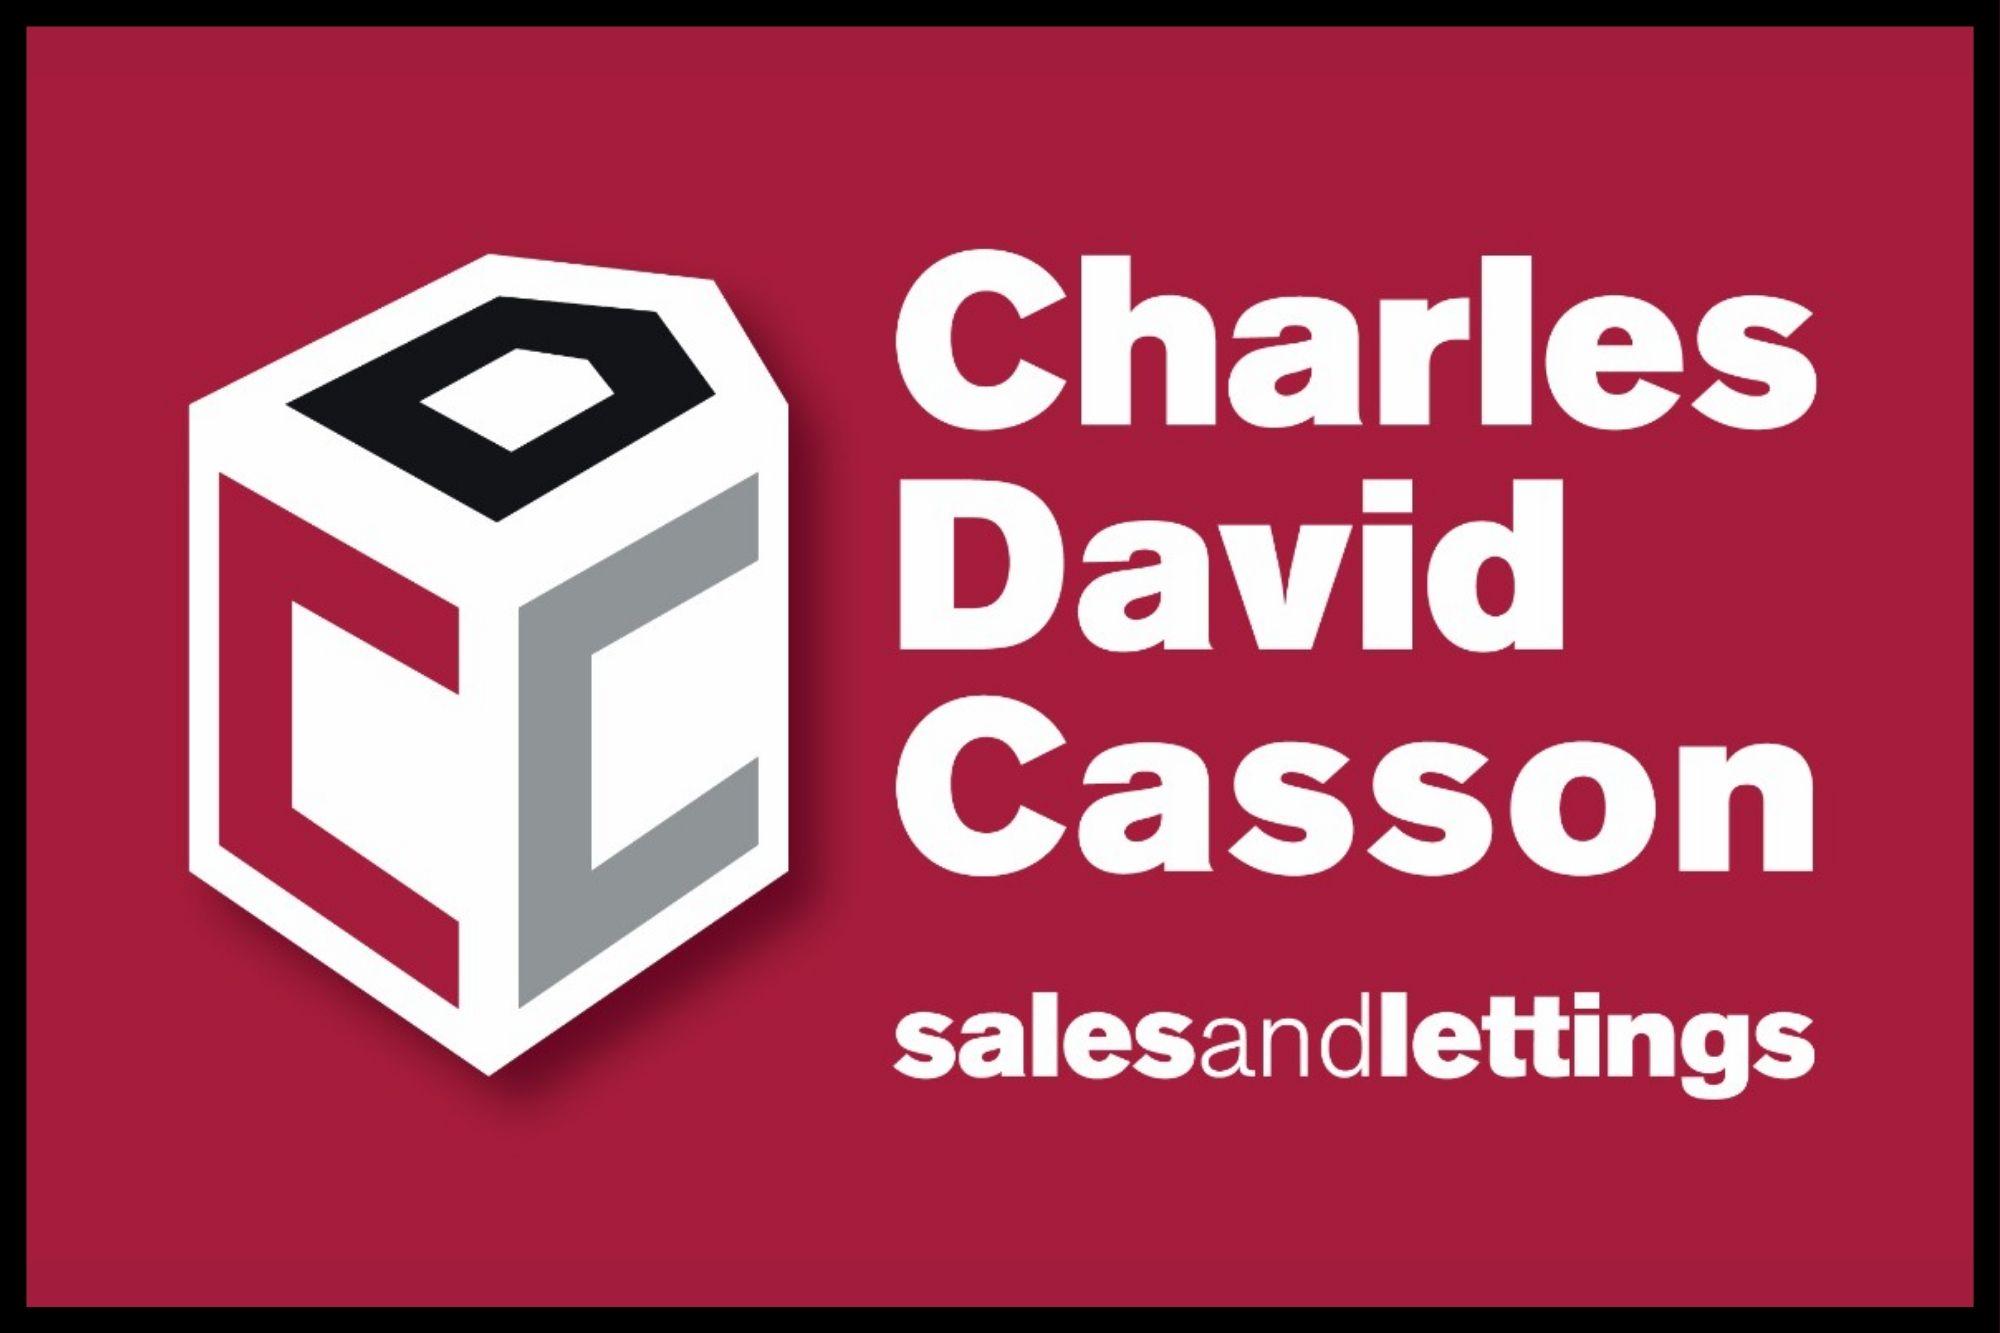 Charles David Casson